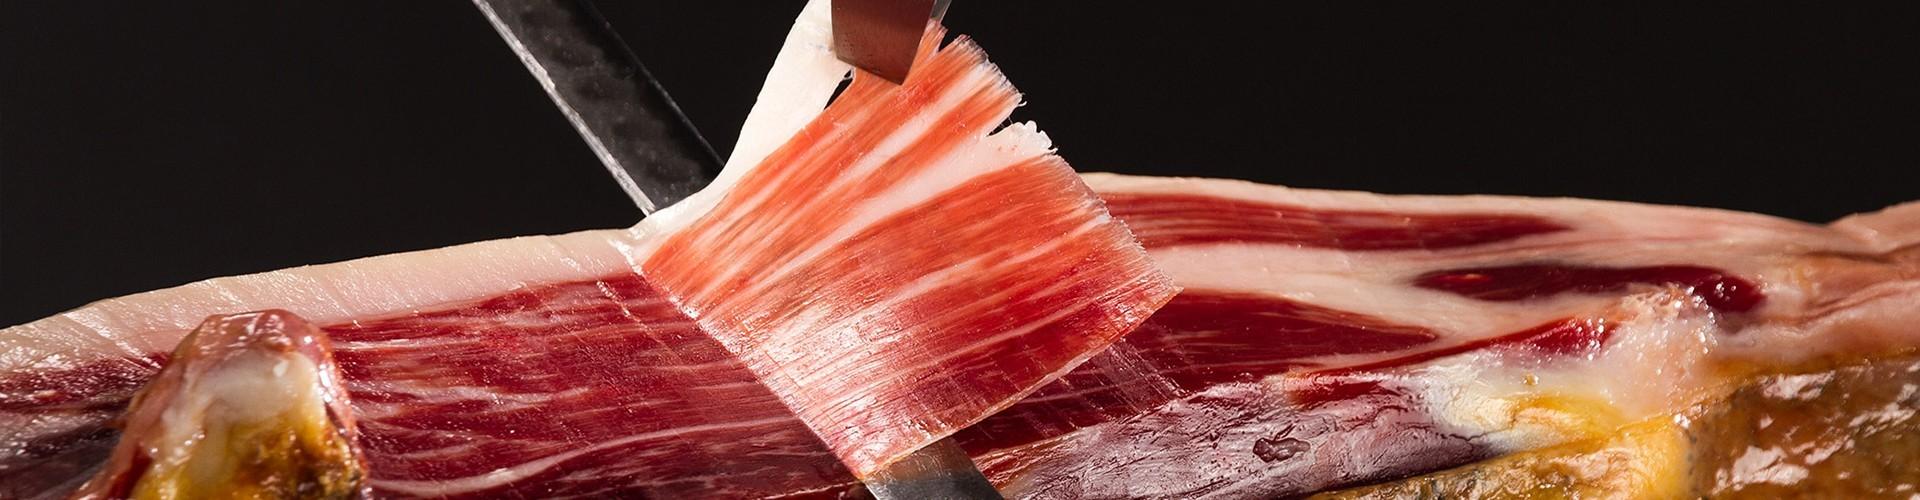 Paleta de bellota 75 ibérica etiqueta roja dehesa de extremadura